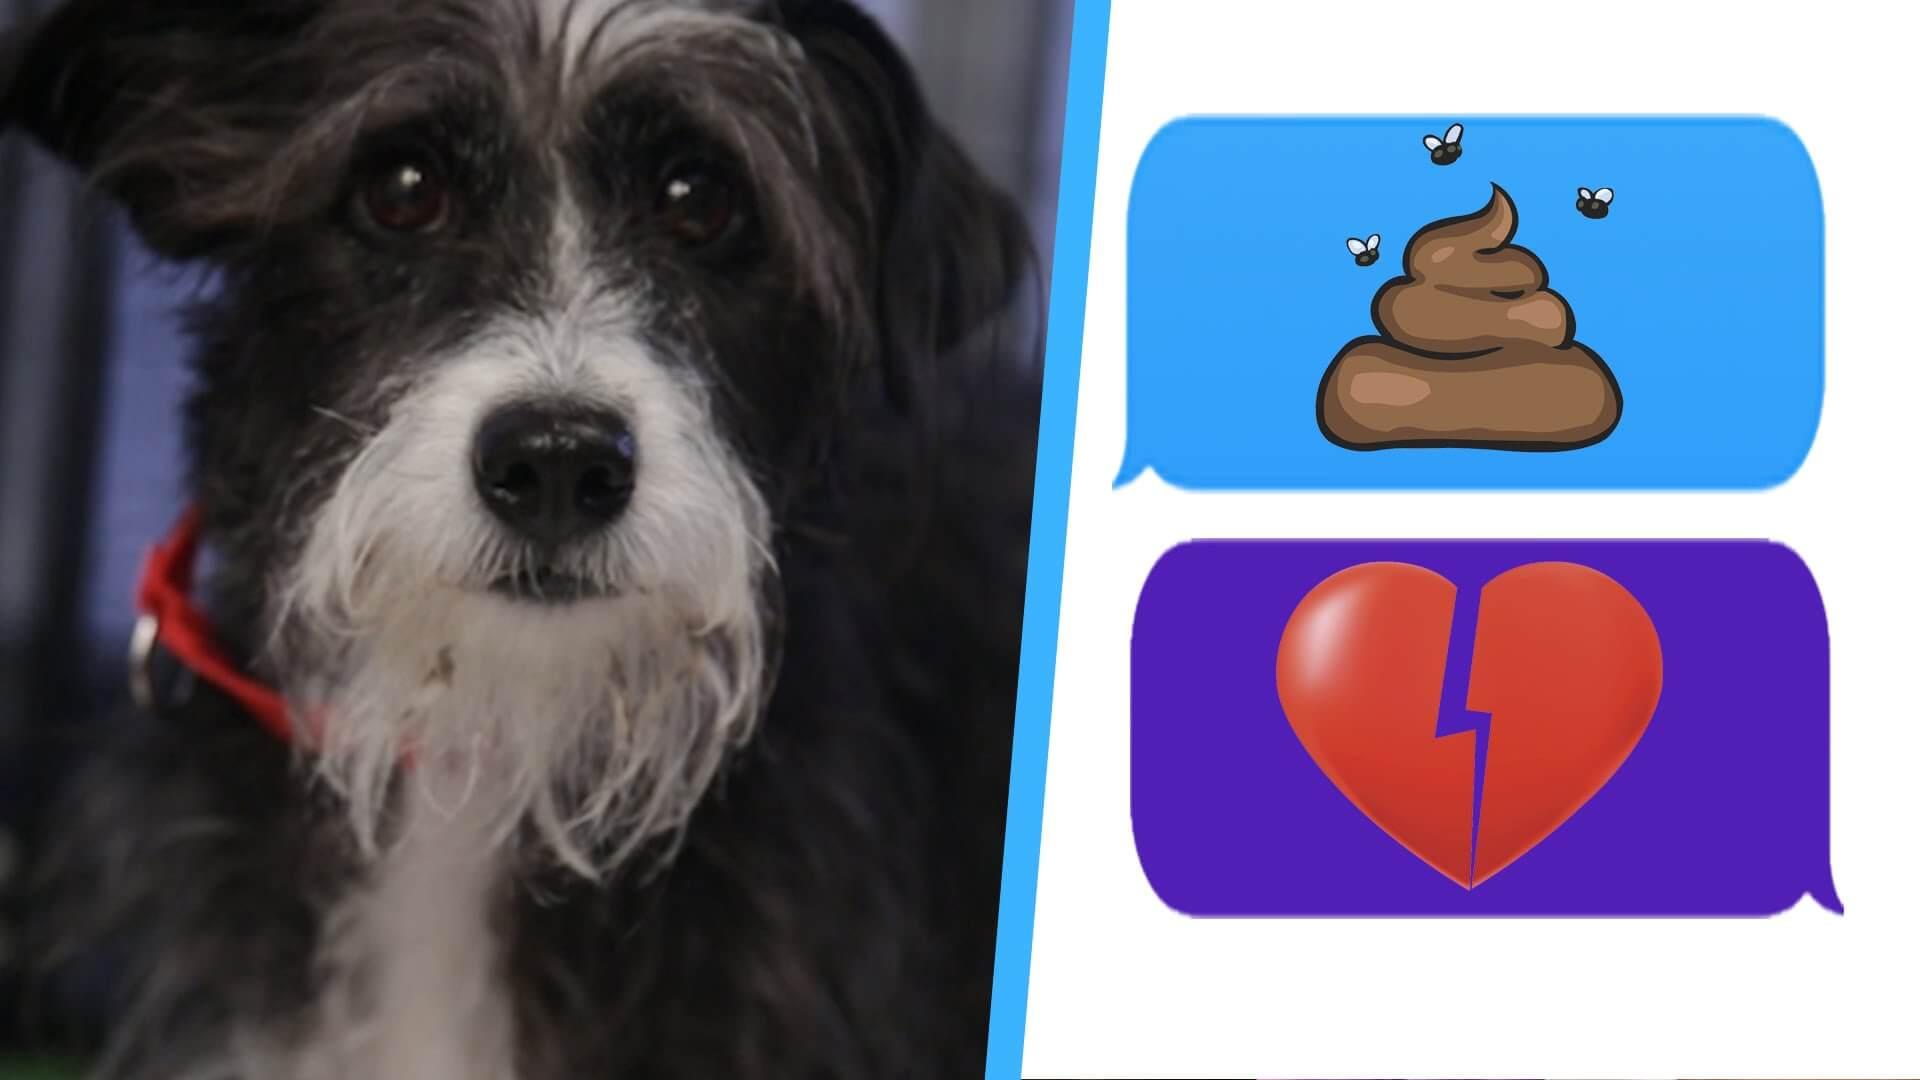 Sweet Dogs On Social Pocket Pitbull Miniature Pitbulls Haha Ny Dog Eat A Pepsi bark post Funny Dog Eat A Pepsi